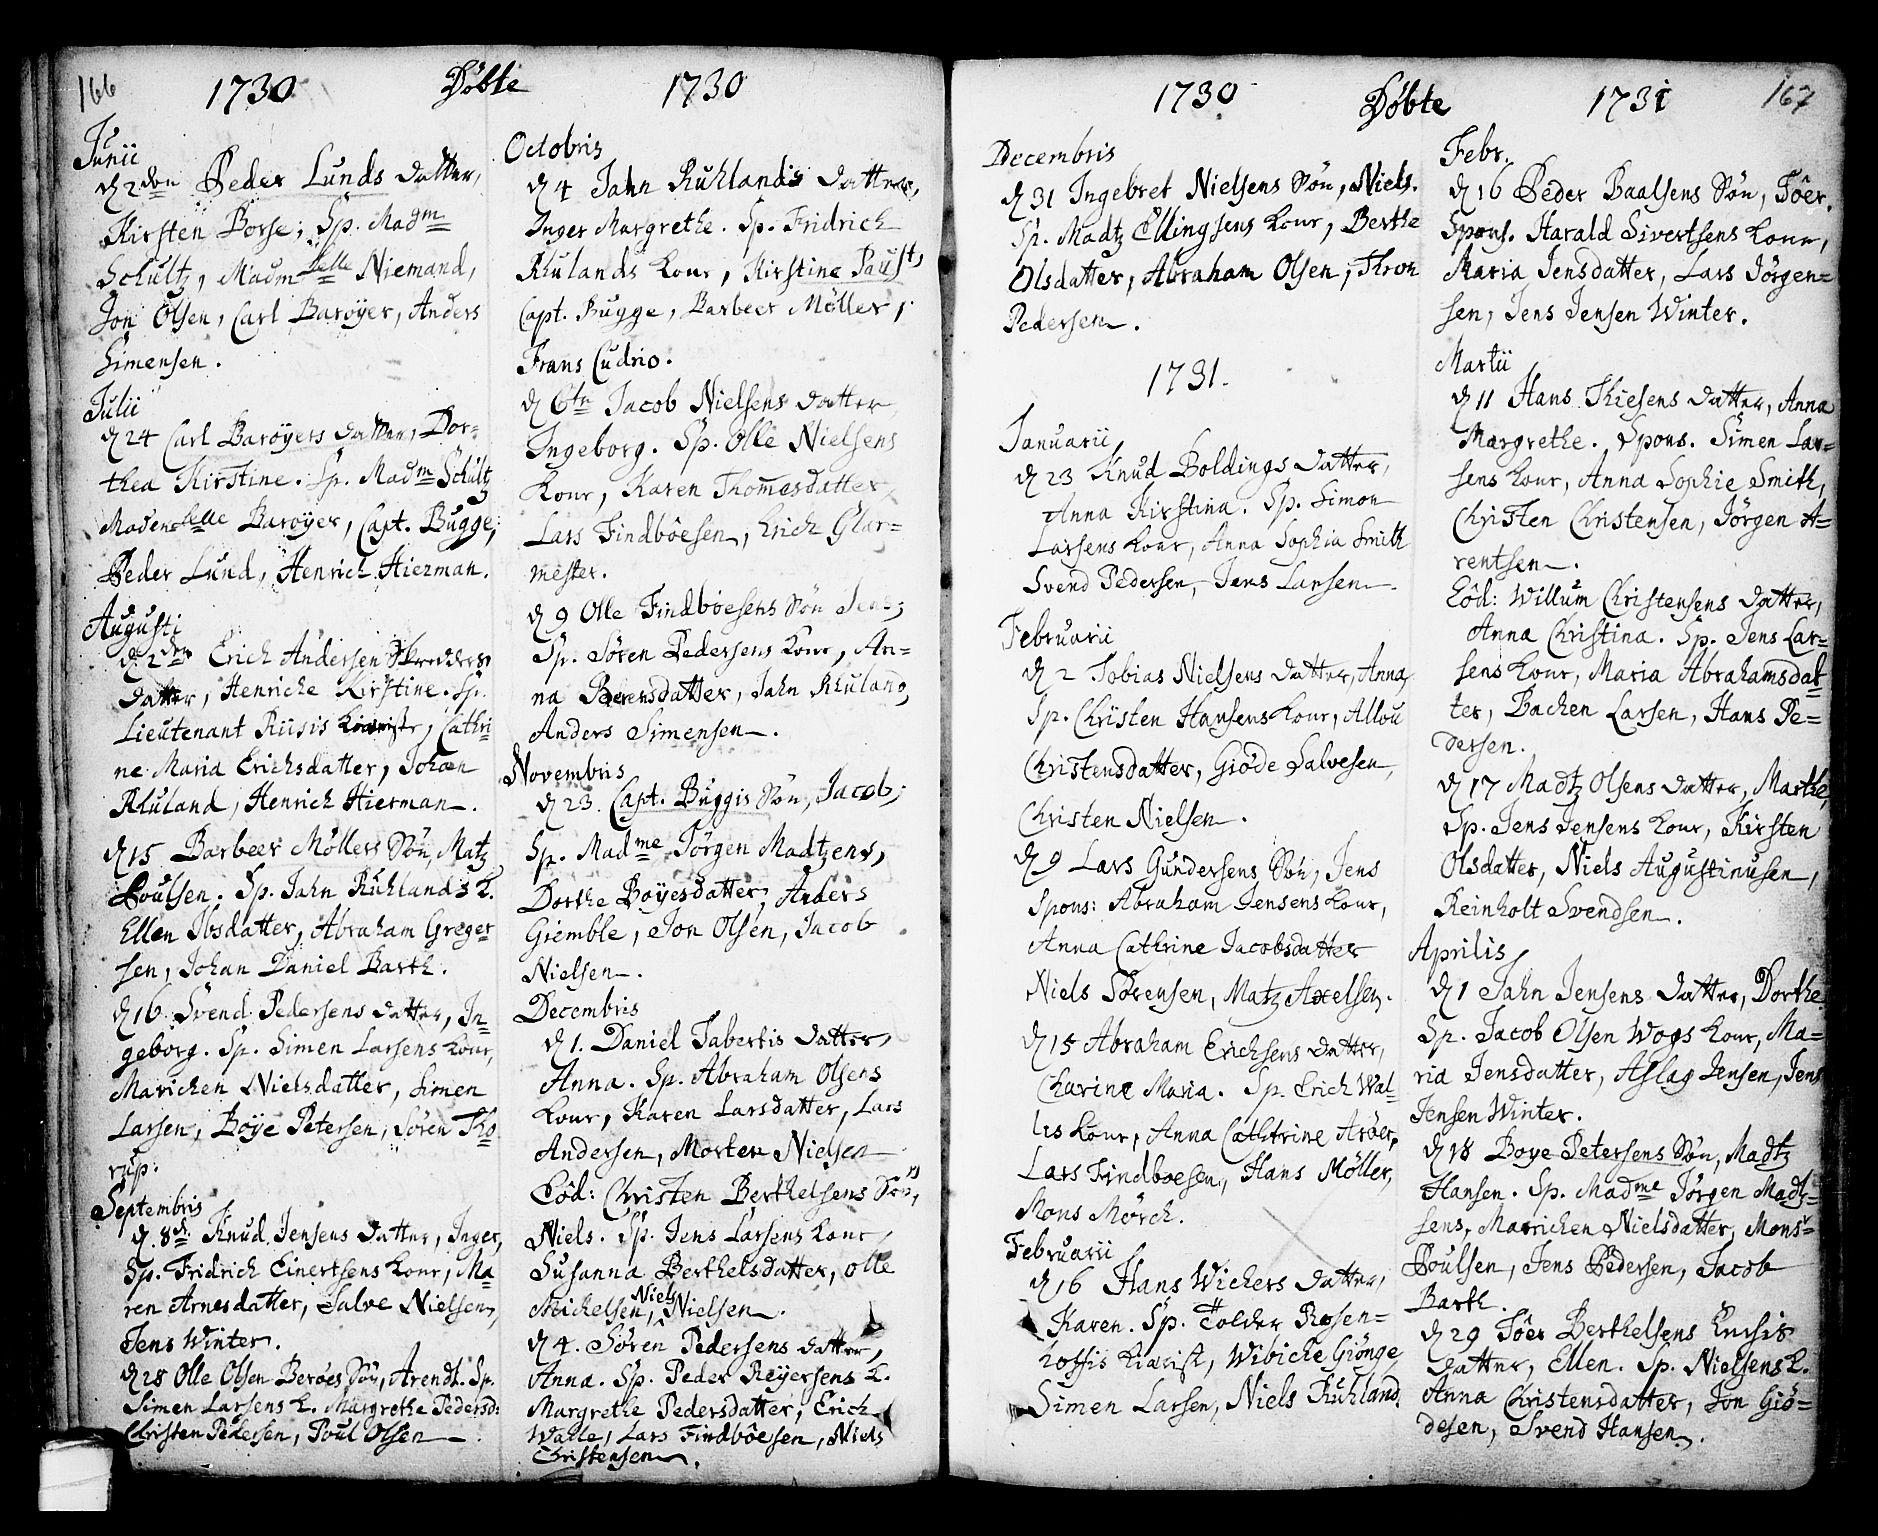 SAKO, Kragerø kirkebøker, F/Fa/L0001: Ministerialbok nr. 1, 1702-1766, s. 166-167